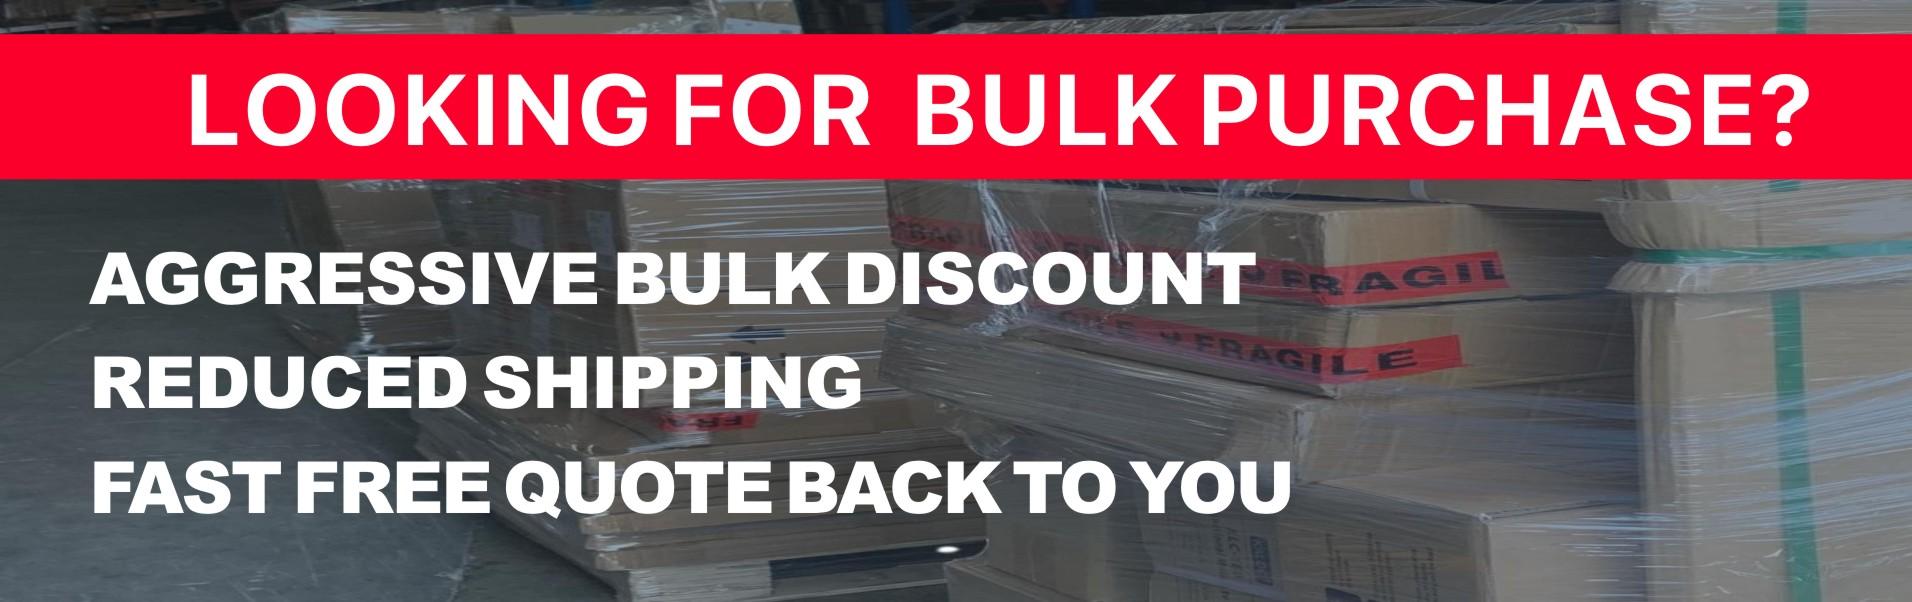 bulk-purchase-banner-a.jpg